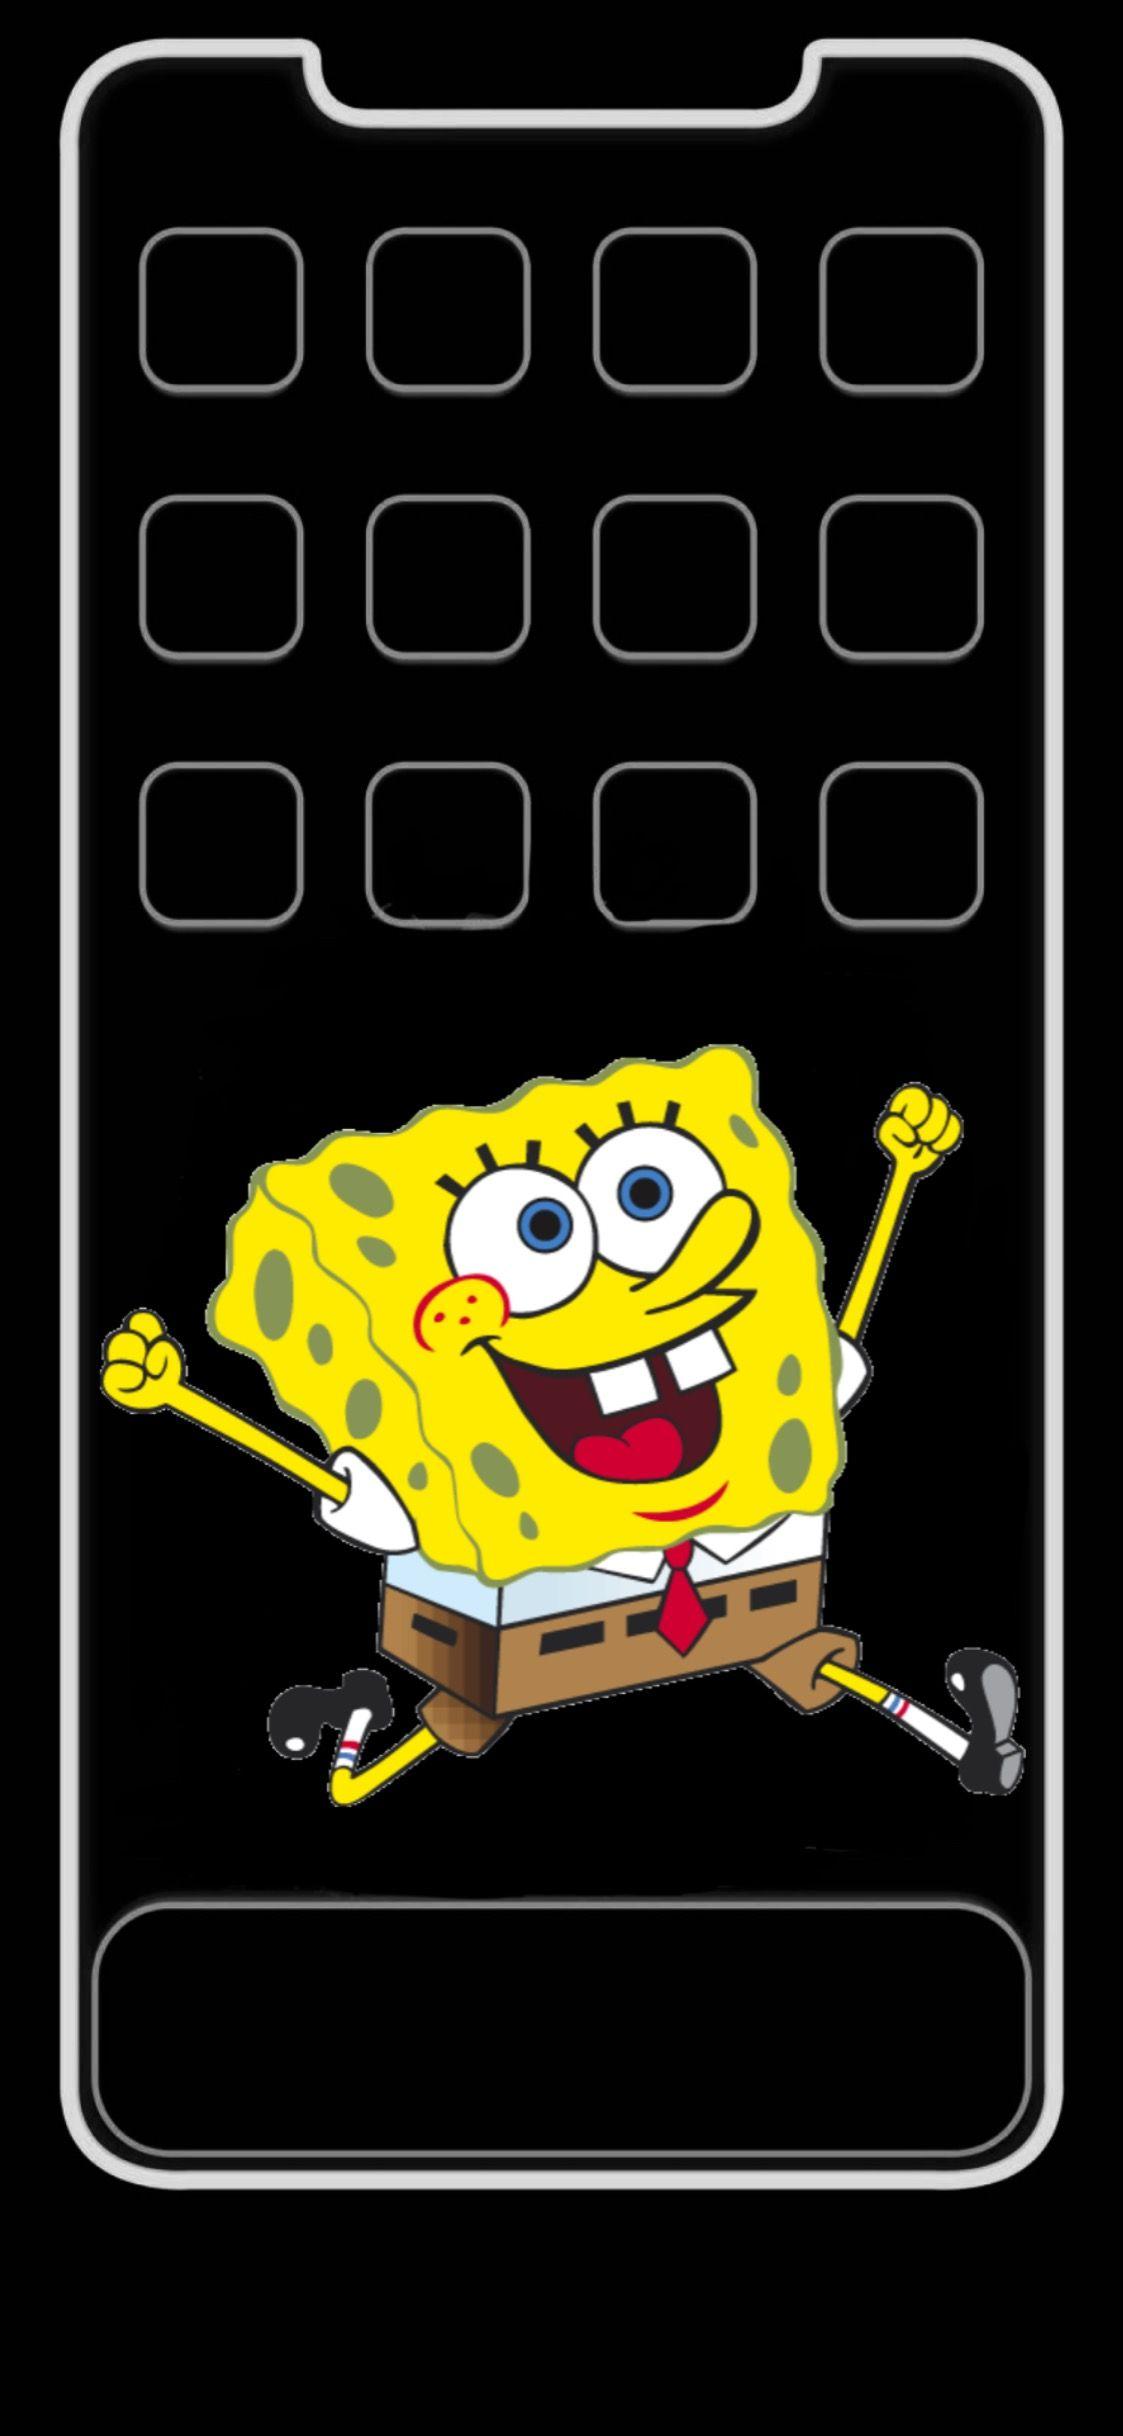 Spongebob Iphone Xs Max Wallpaper Apple Wallpaper Apple Wallpaper Iphone Iphone Wallpaper